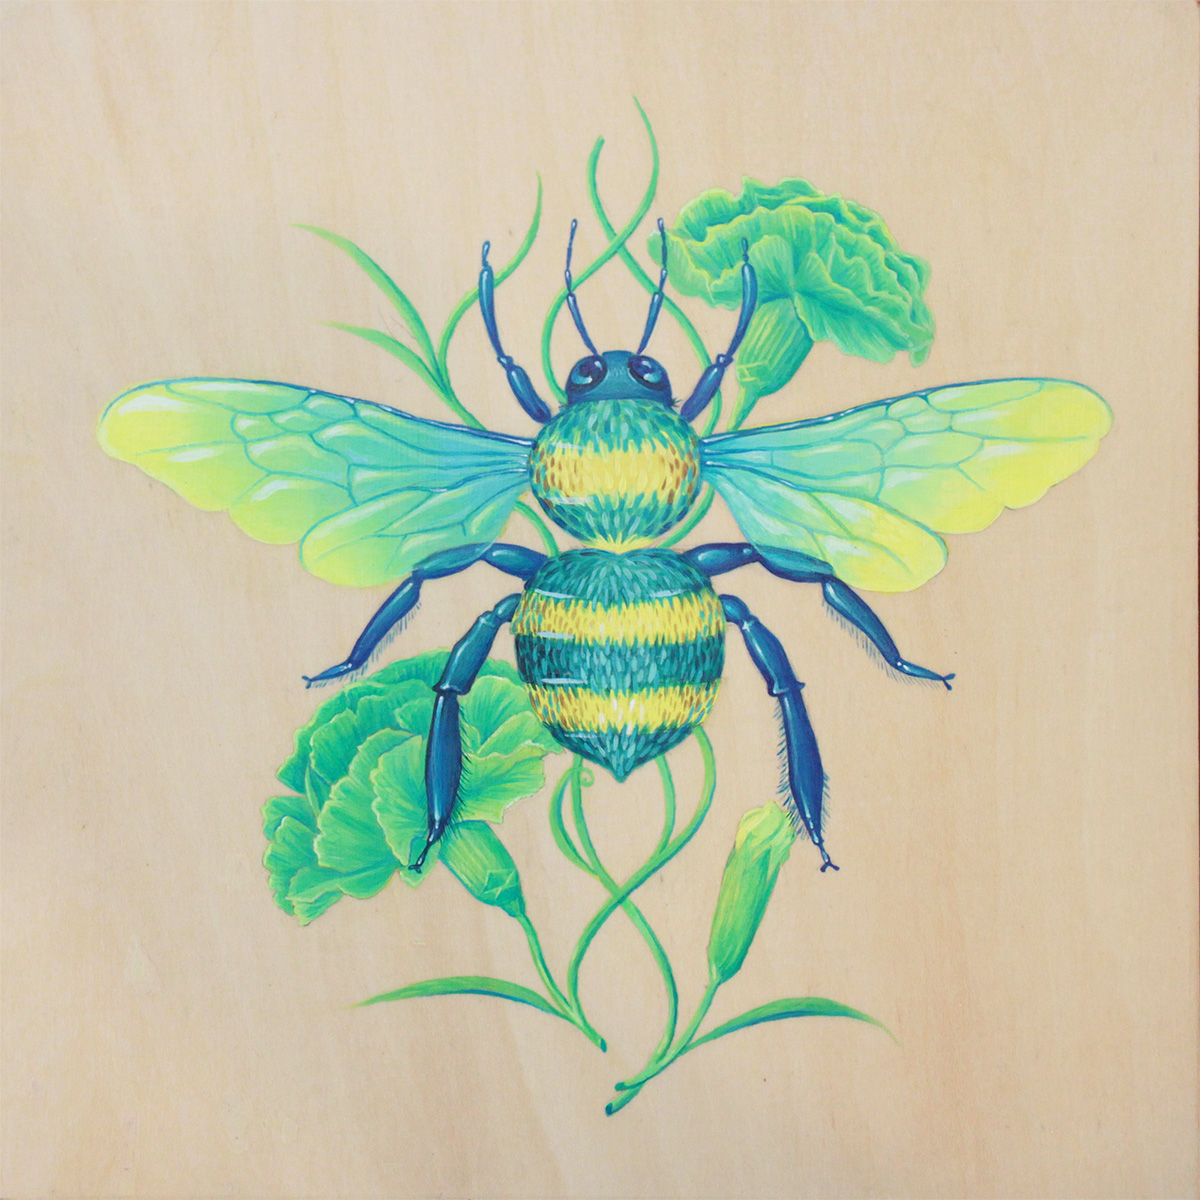 """Uncanny Love"" [Dianthus caryophyllus & Xylocopa virginica], Acrylic on wood panel, 8x8"". 2017."